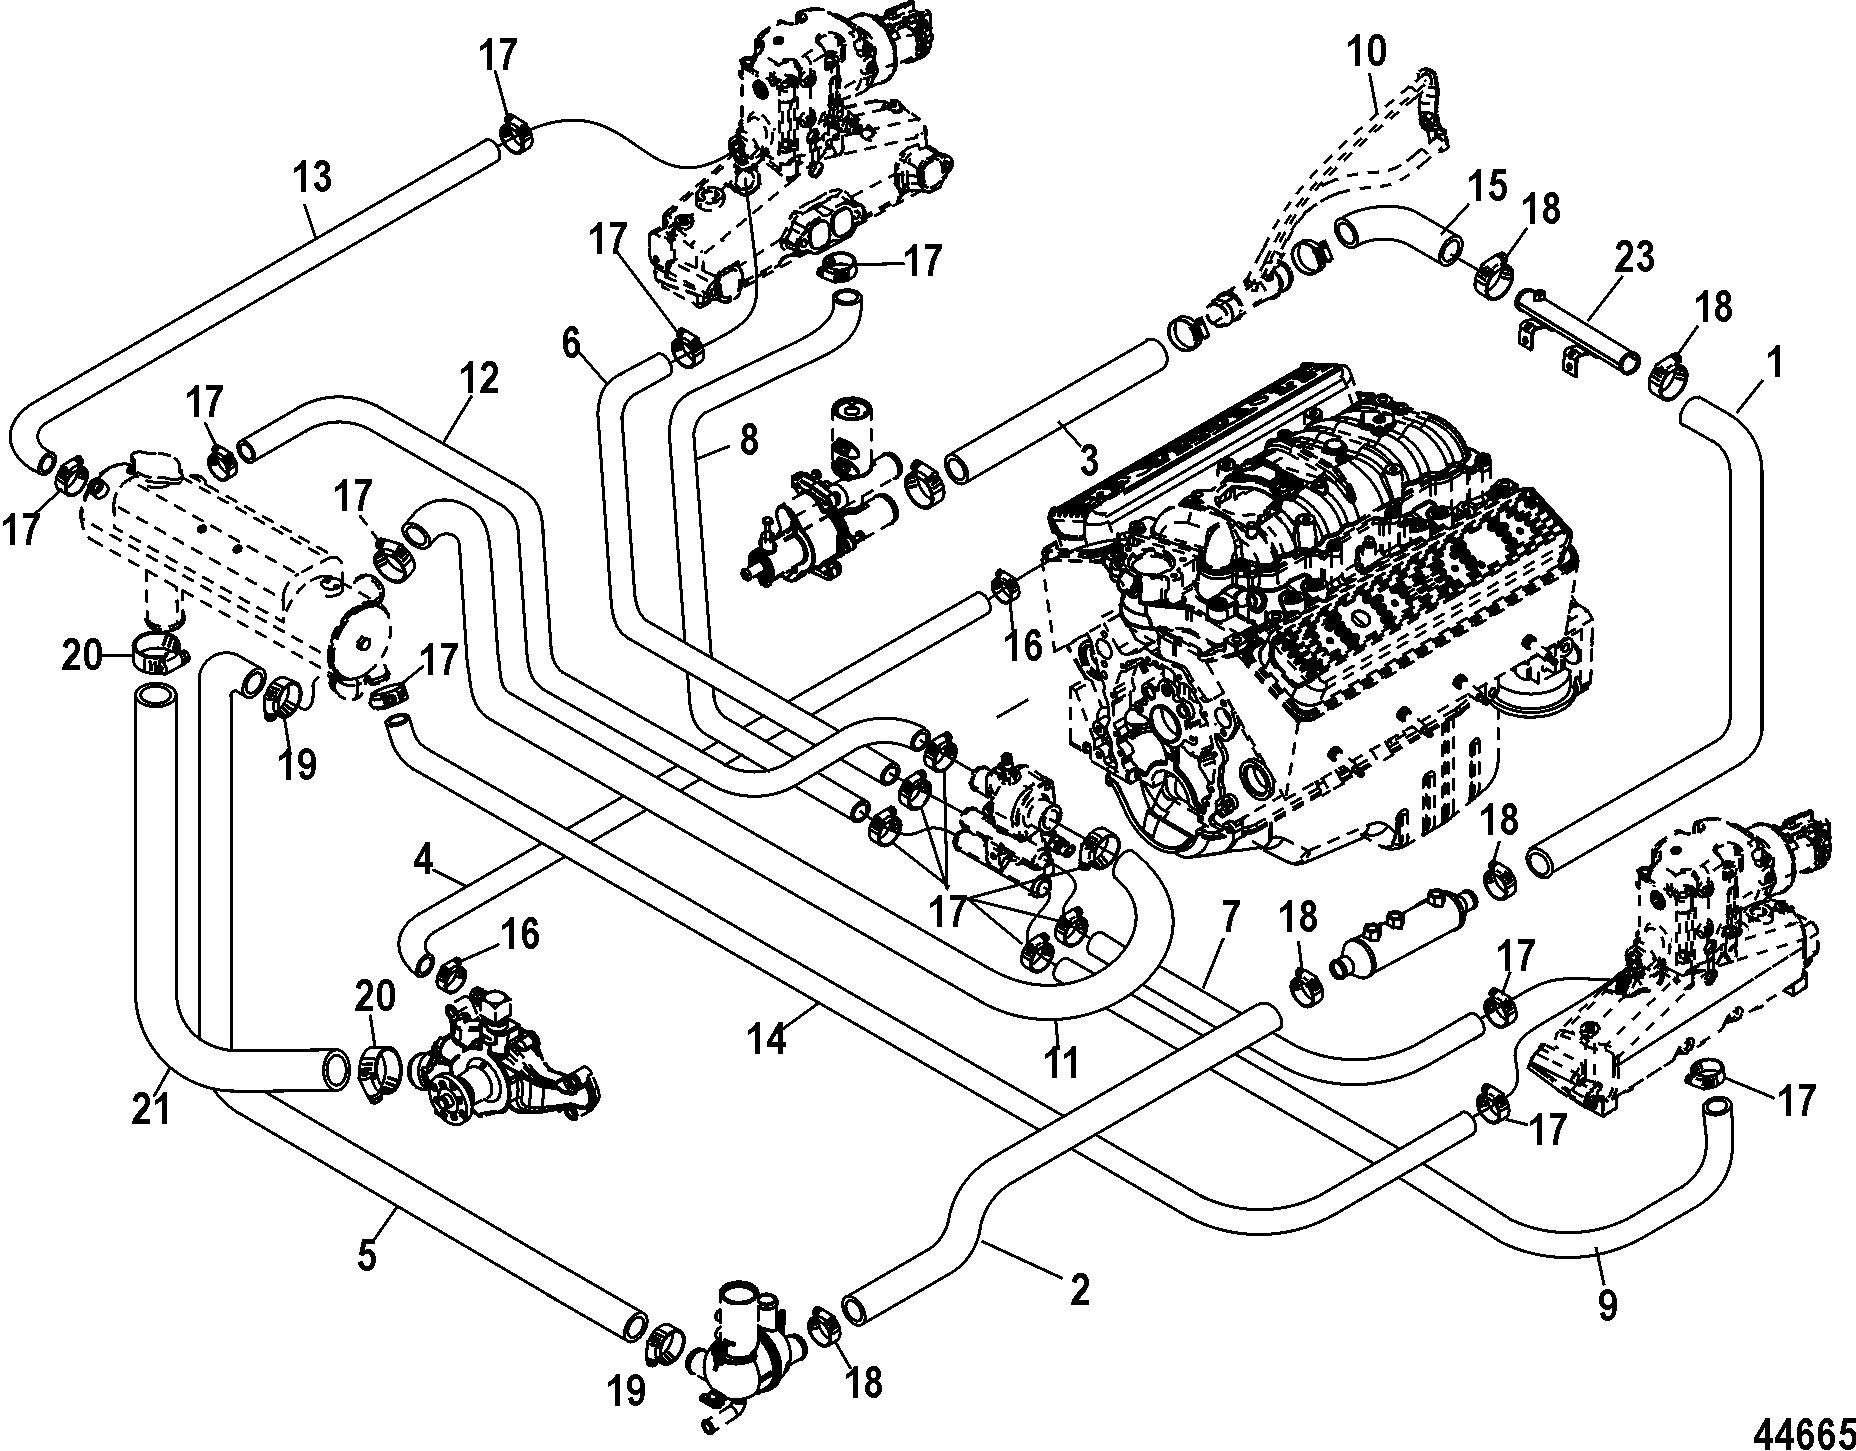 hight resolution of 350 mercruiser cooling system diagram circuit wiring and diagram hub u2022 7 4 mercruiser cooling system